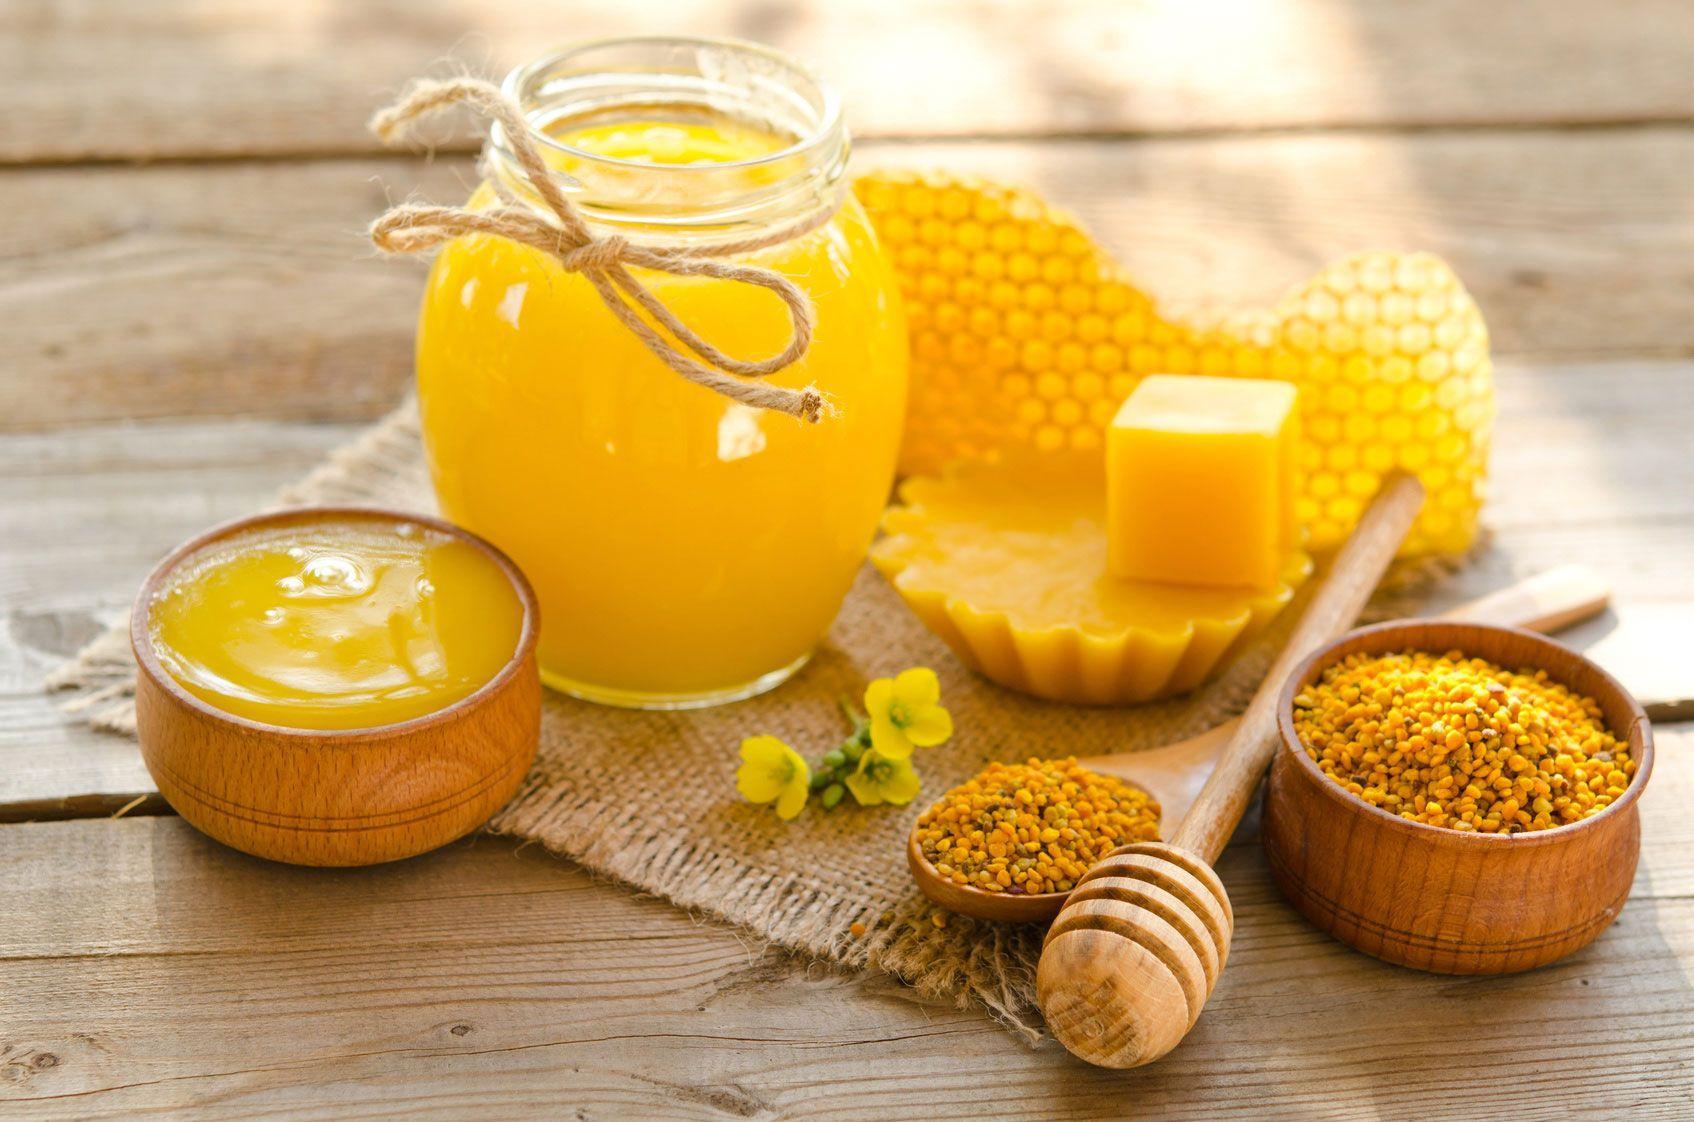 Miel pollen gelee royale ils soignent